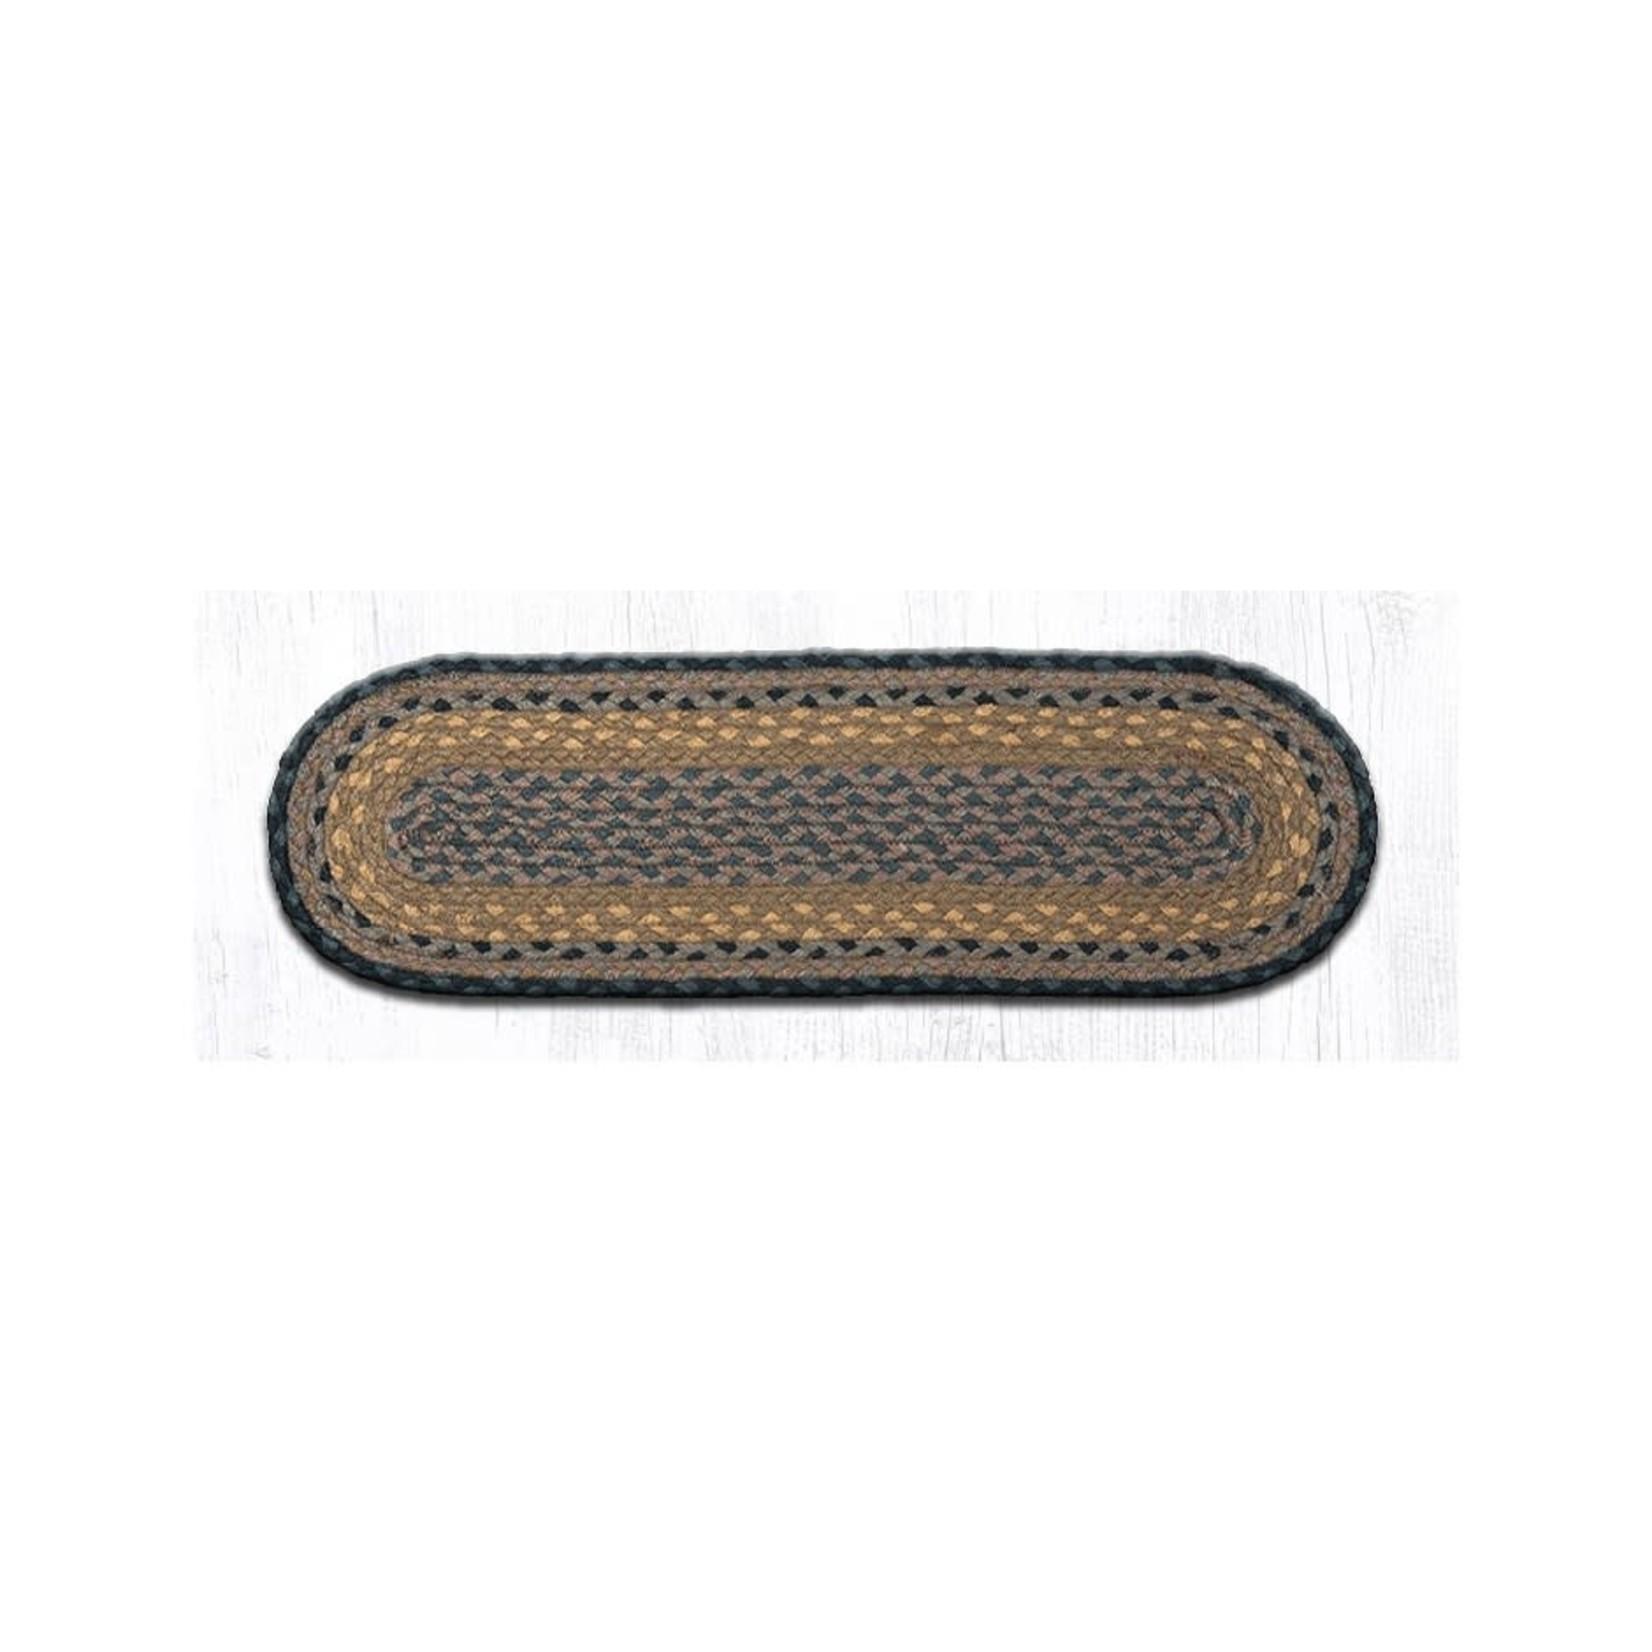 C-99 Brown/Black/Charcoal Braided Rug